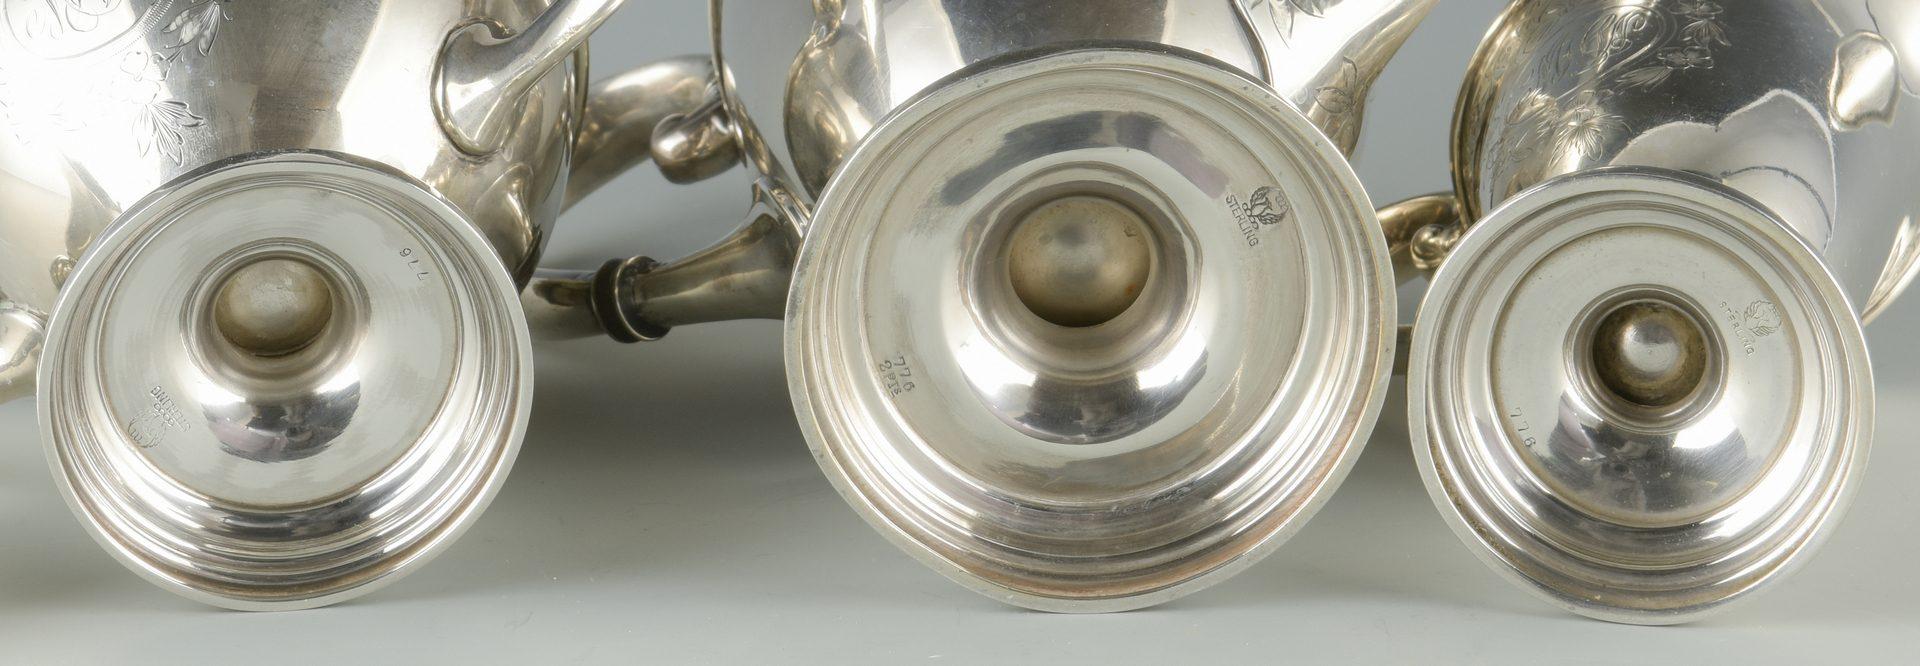 Lot 927: Meriden Sterling Tea Set, 3 pcs.